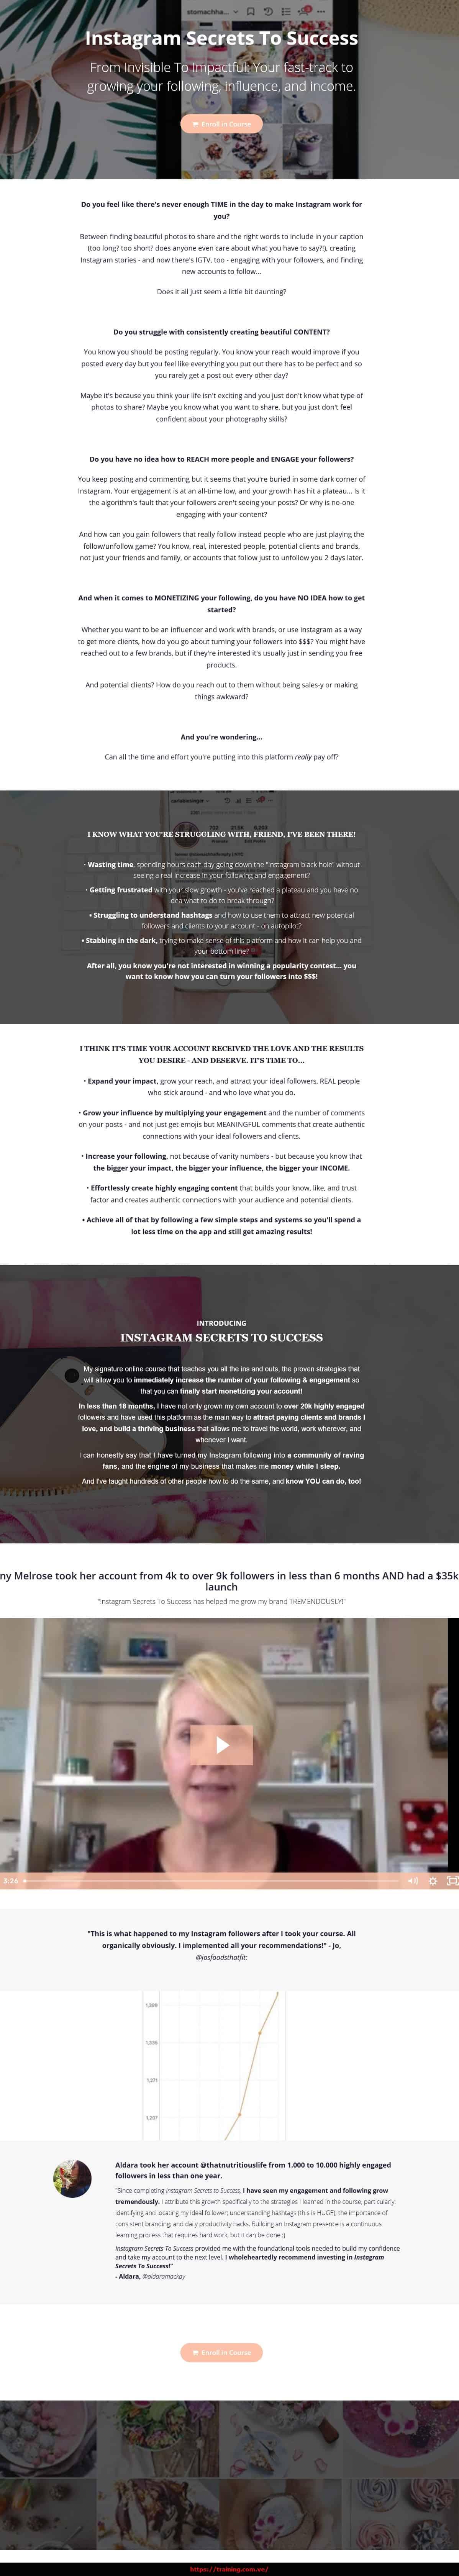 Instagram Secrets To Success by Carla Biesinger Sales Page